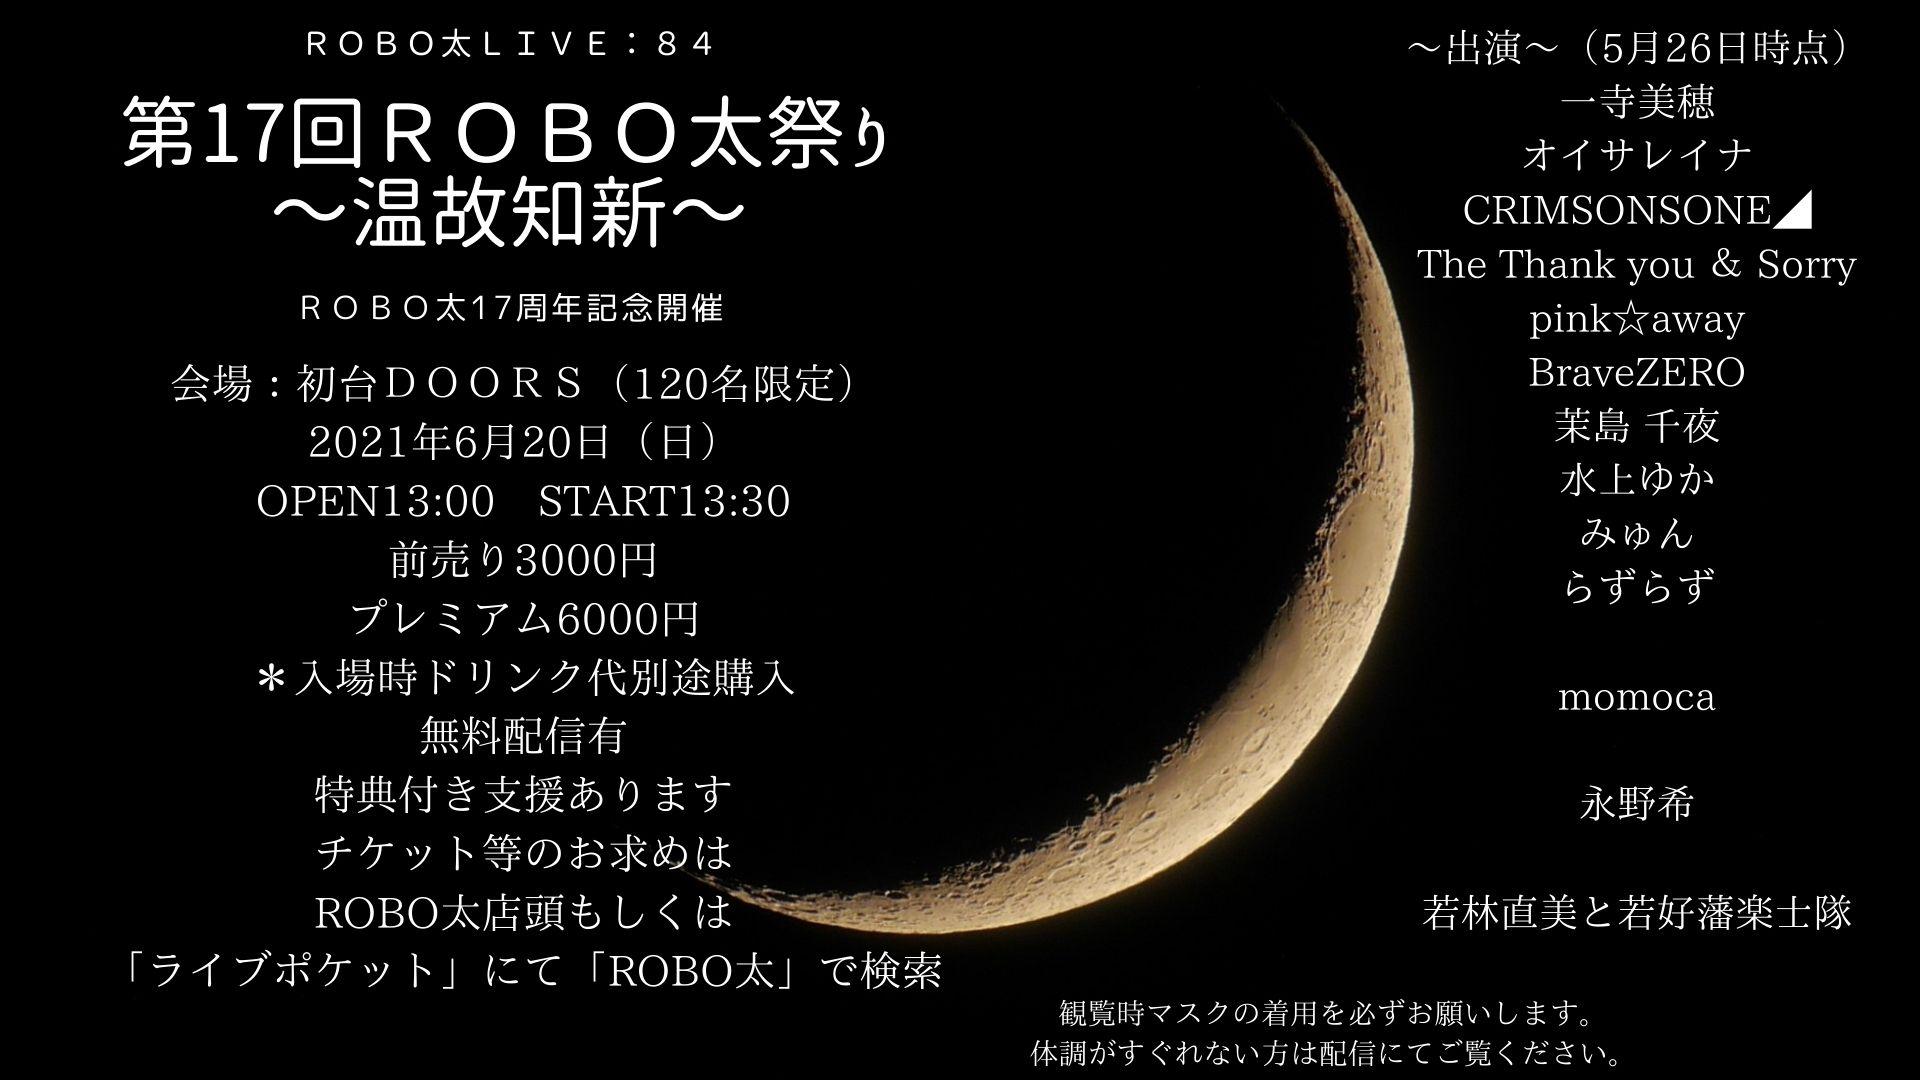 ROBO太17周年記念開催 第17回ROBO太祭り~温故知新~